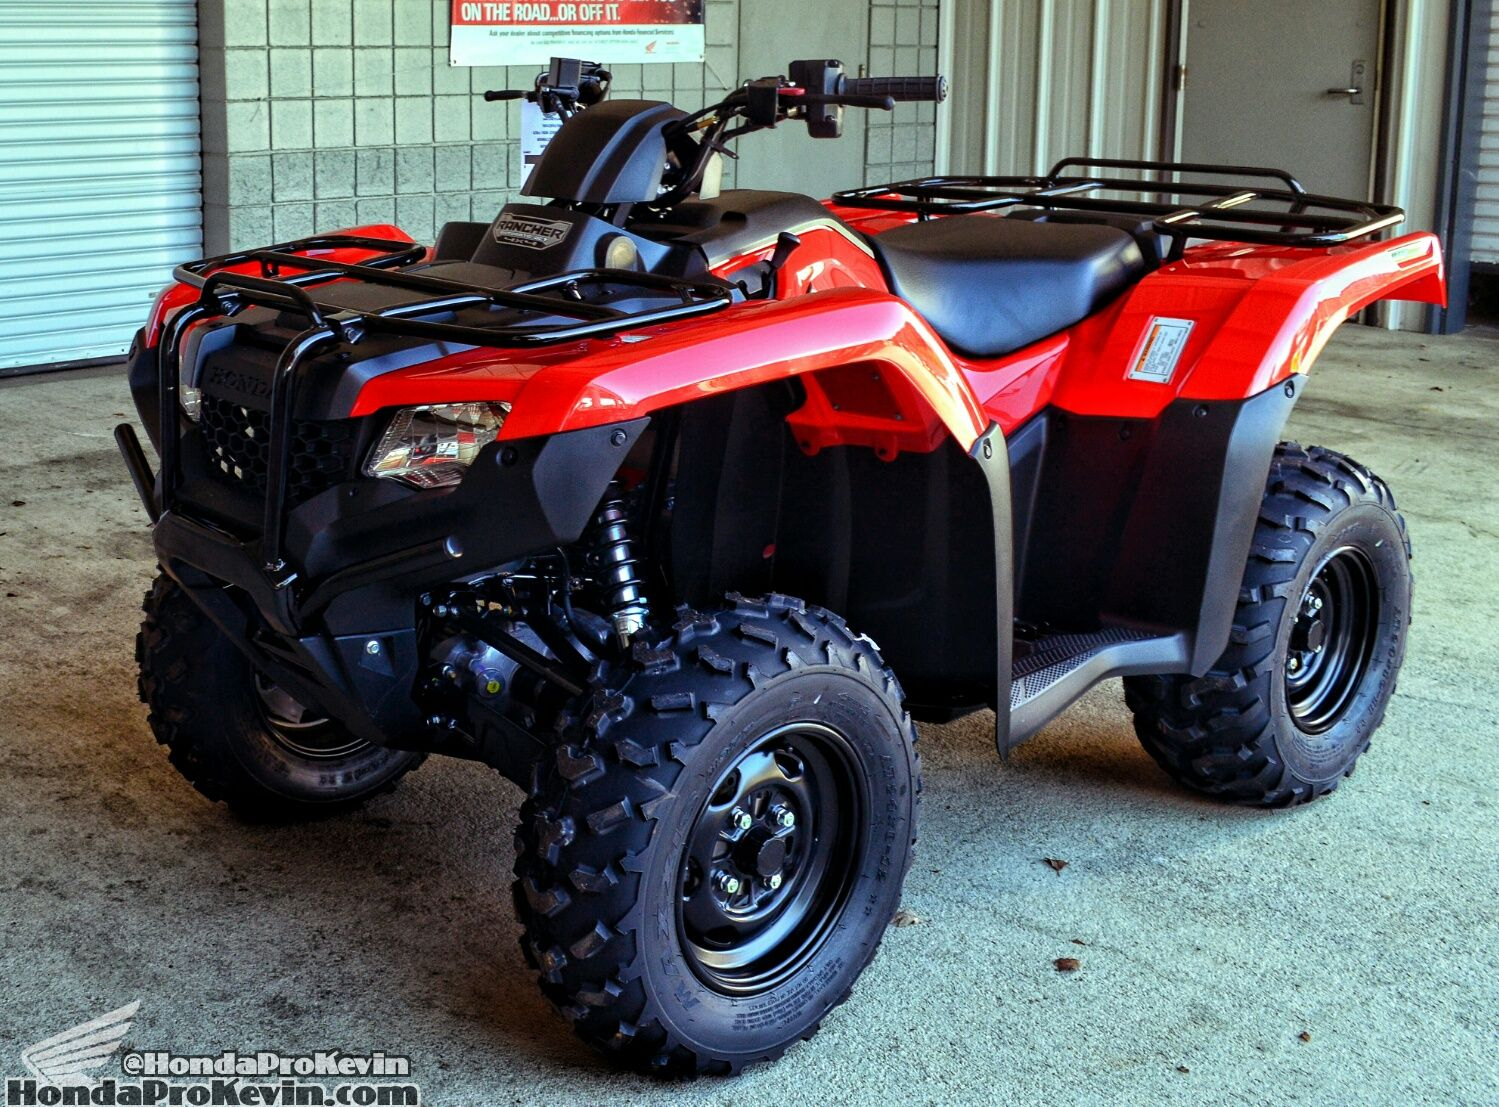 2018 Honda Rancher 420 Atv Ride Review Specs 4x4 Four Wheeler Trx420 Honda Rancher 420 Atv Honda